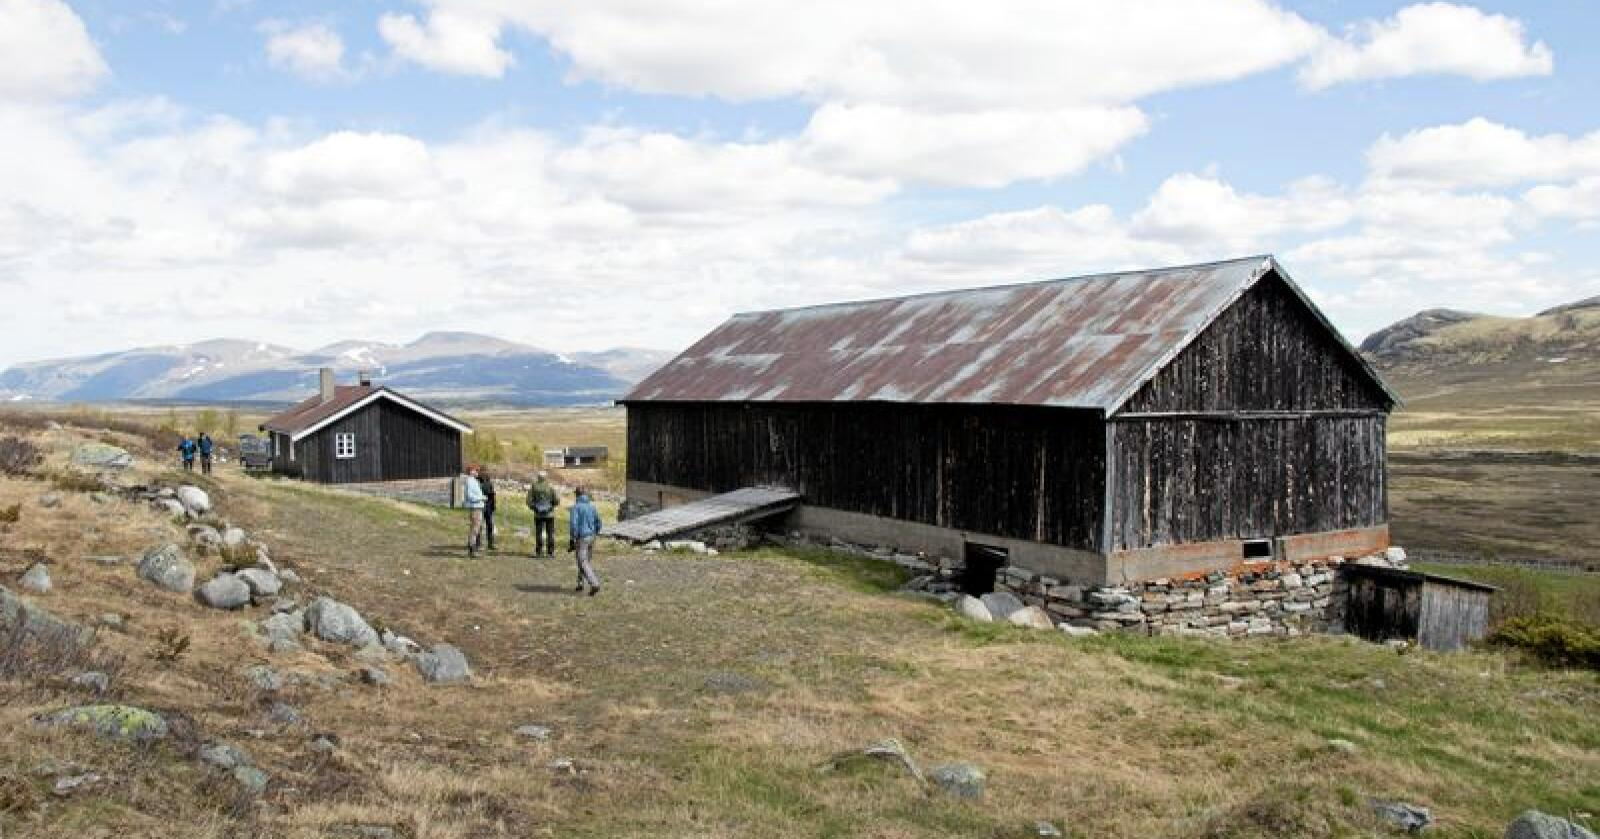 Tusenårig: Seterbygningene i Vesllie er blant de få med grunnmur i stein. Foto: Astrid Kvam Helset